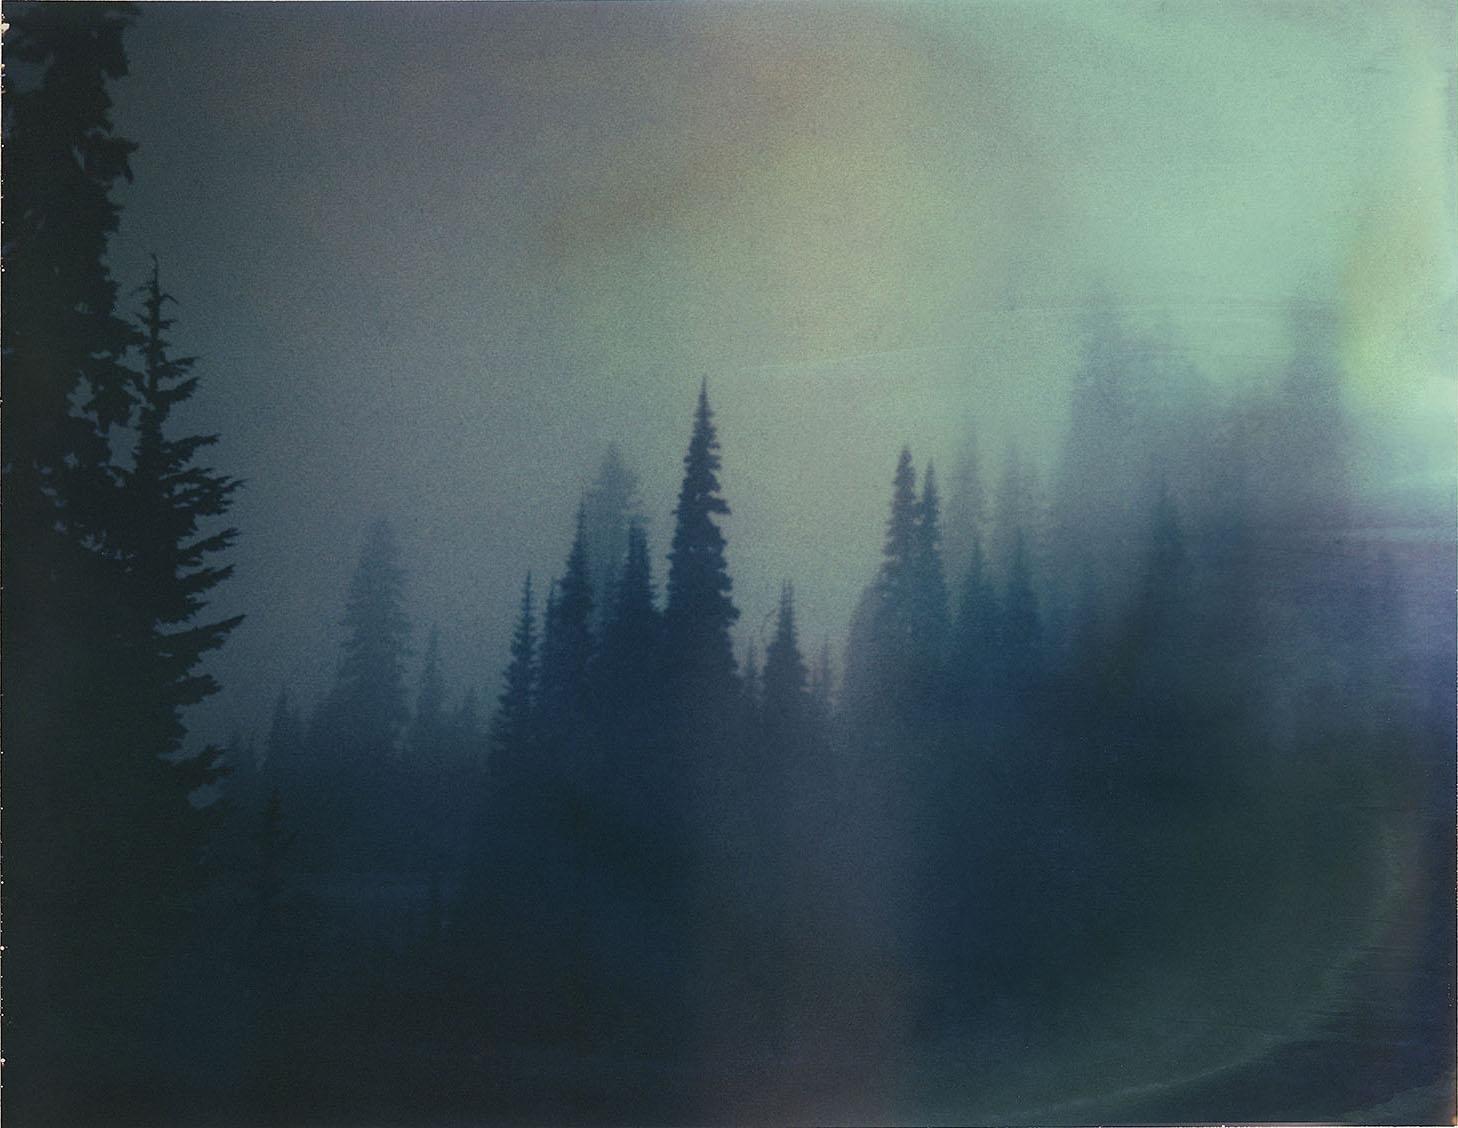 fogtrees002_1.jpg